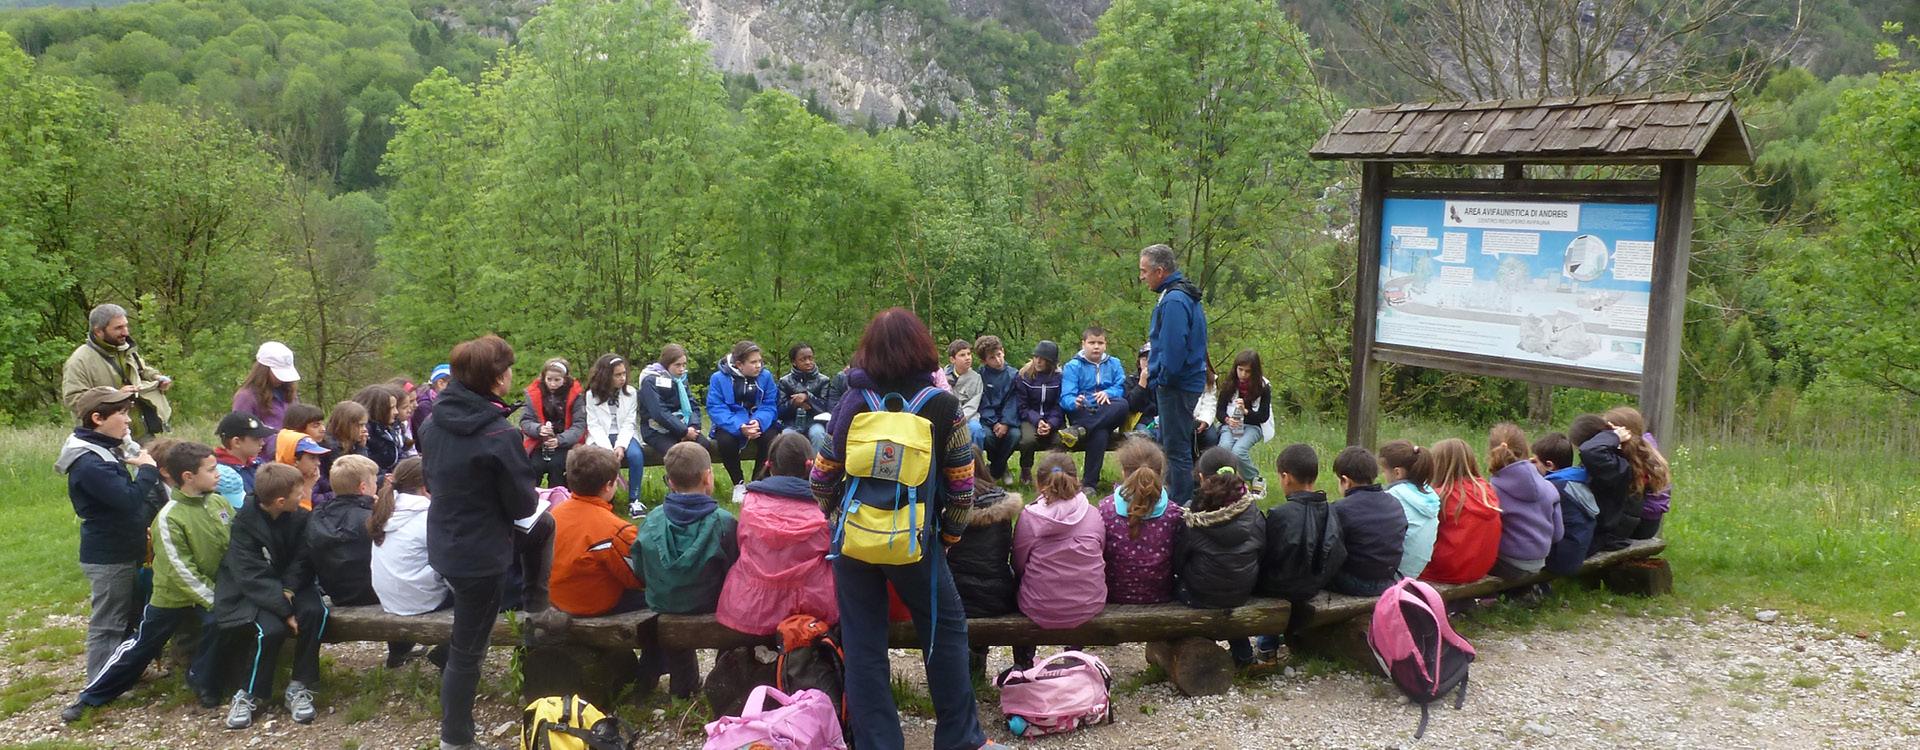 Parco Naturale Dolomiti Friulane